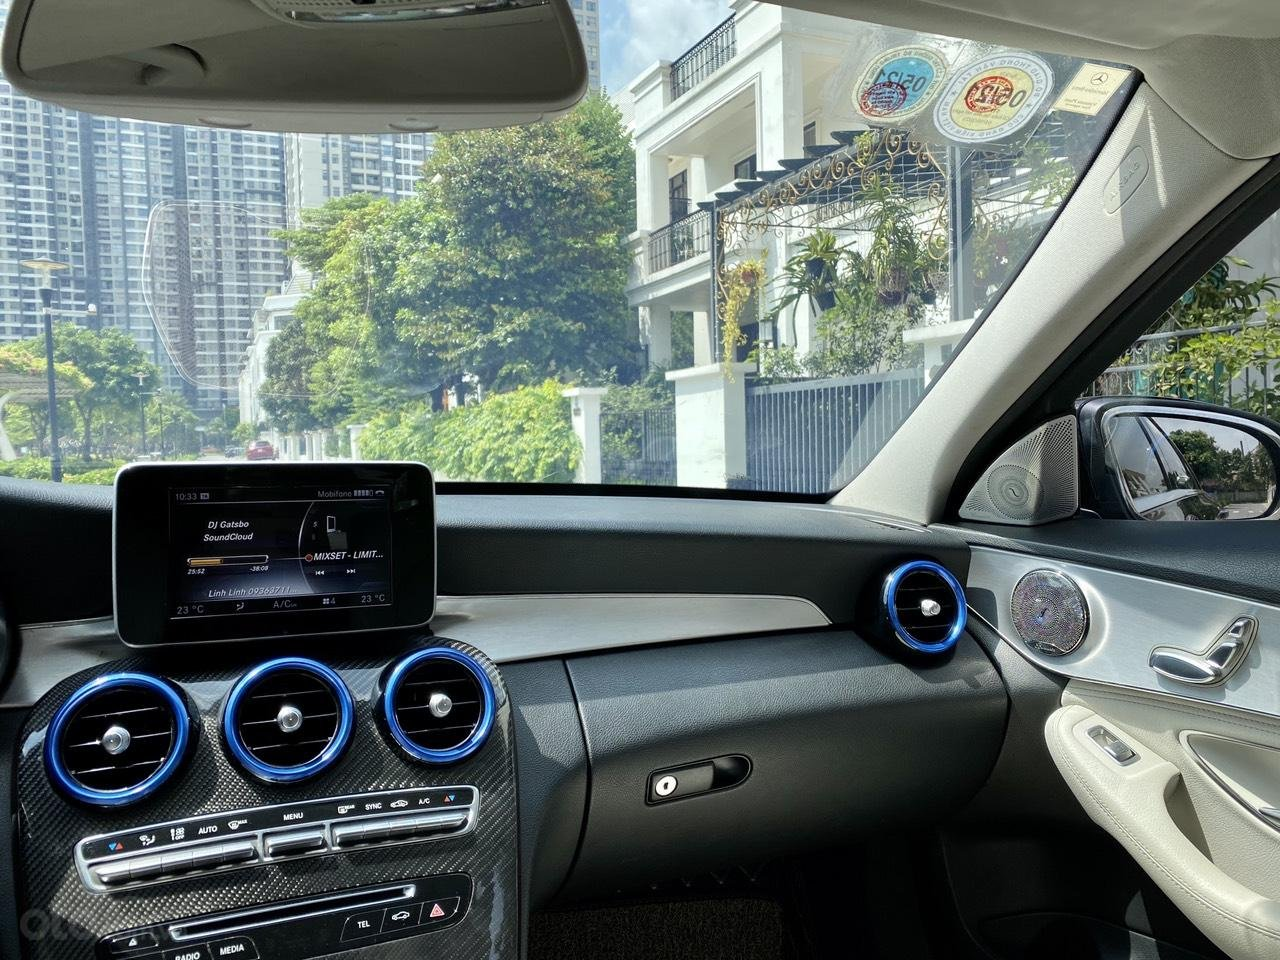 Mercedes C200 sx 2015, đk 2016, màu đen, nội thất kem (11)